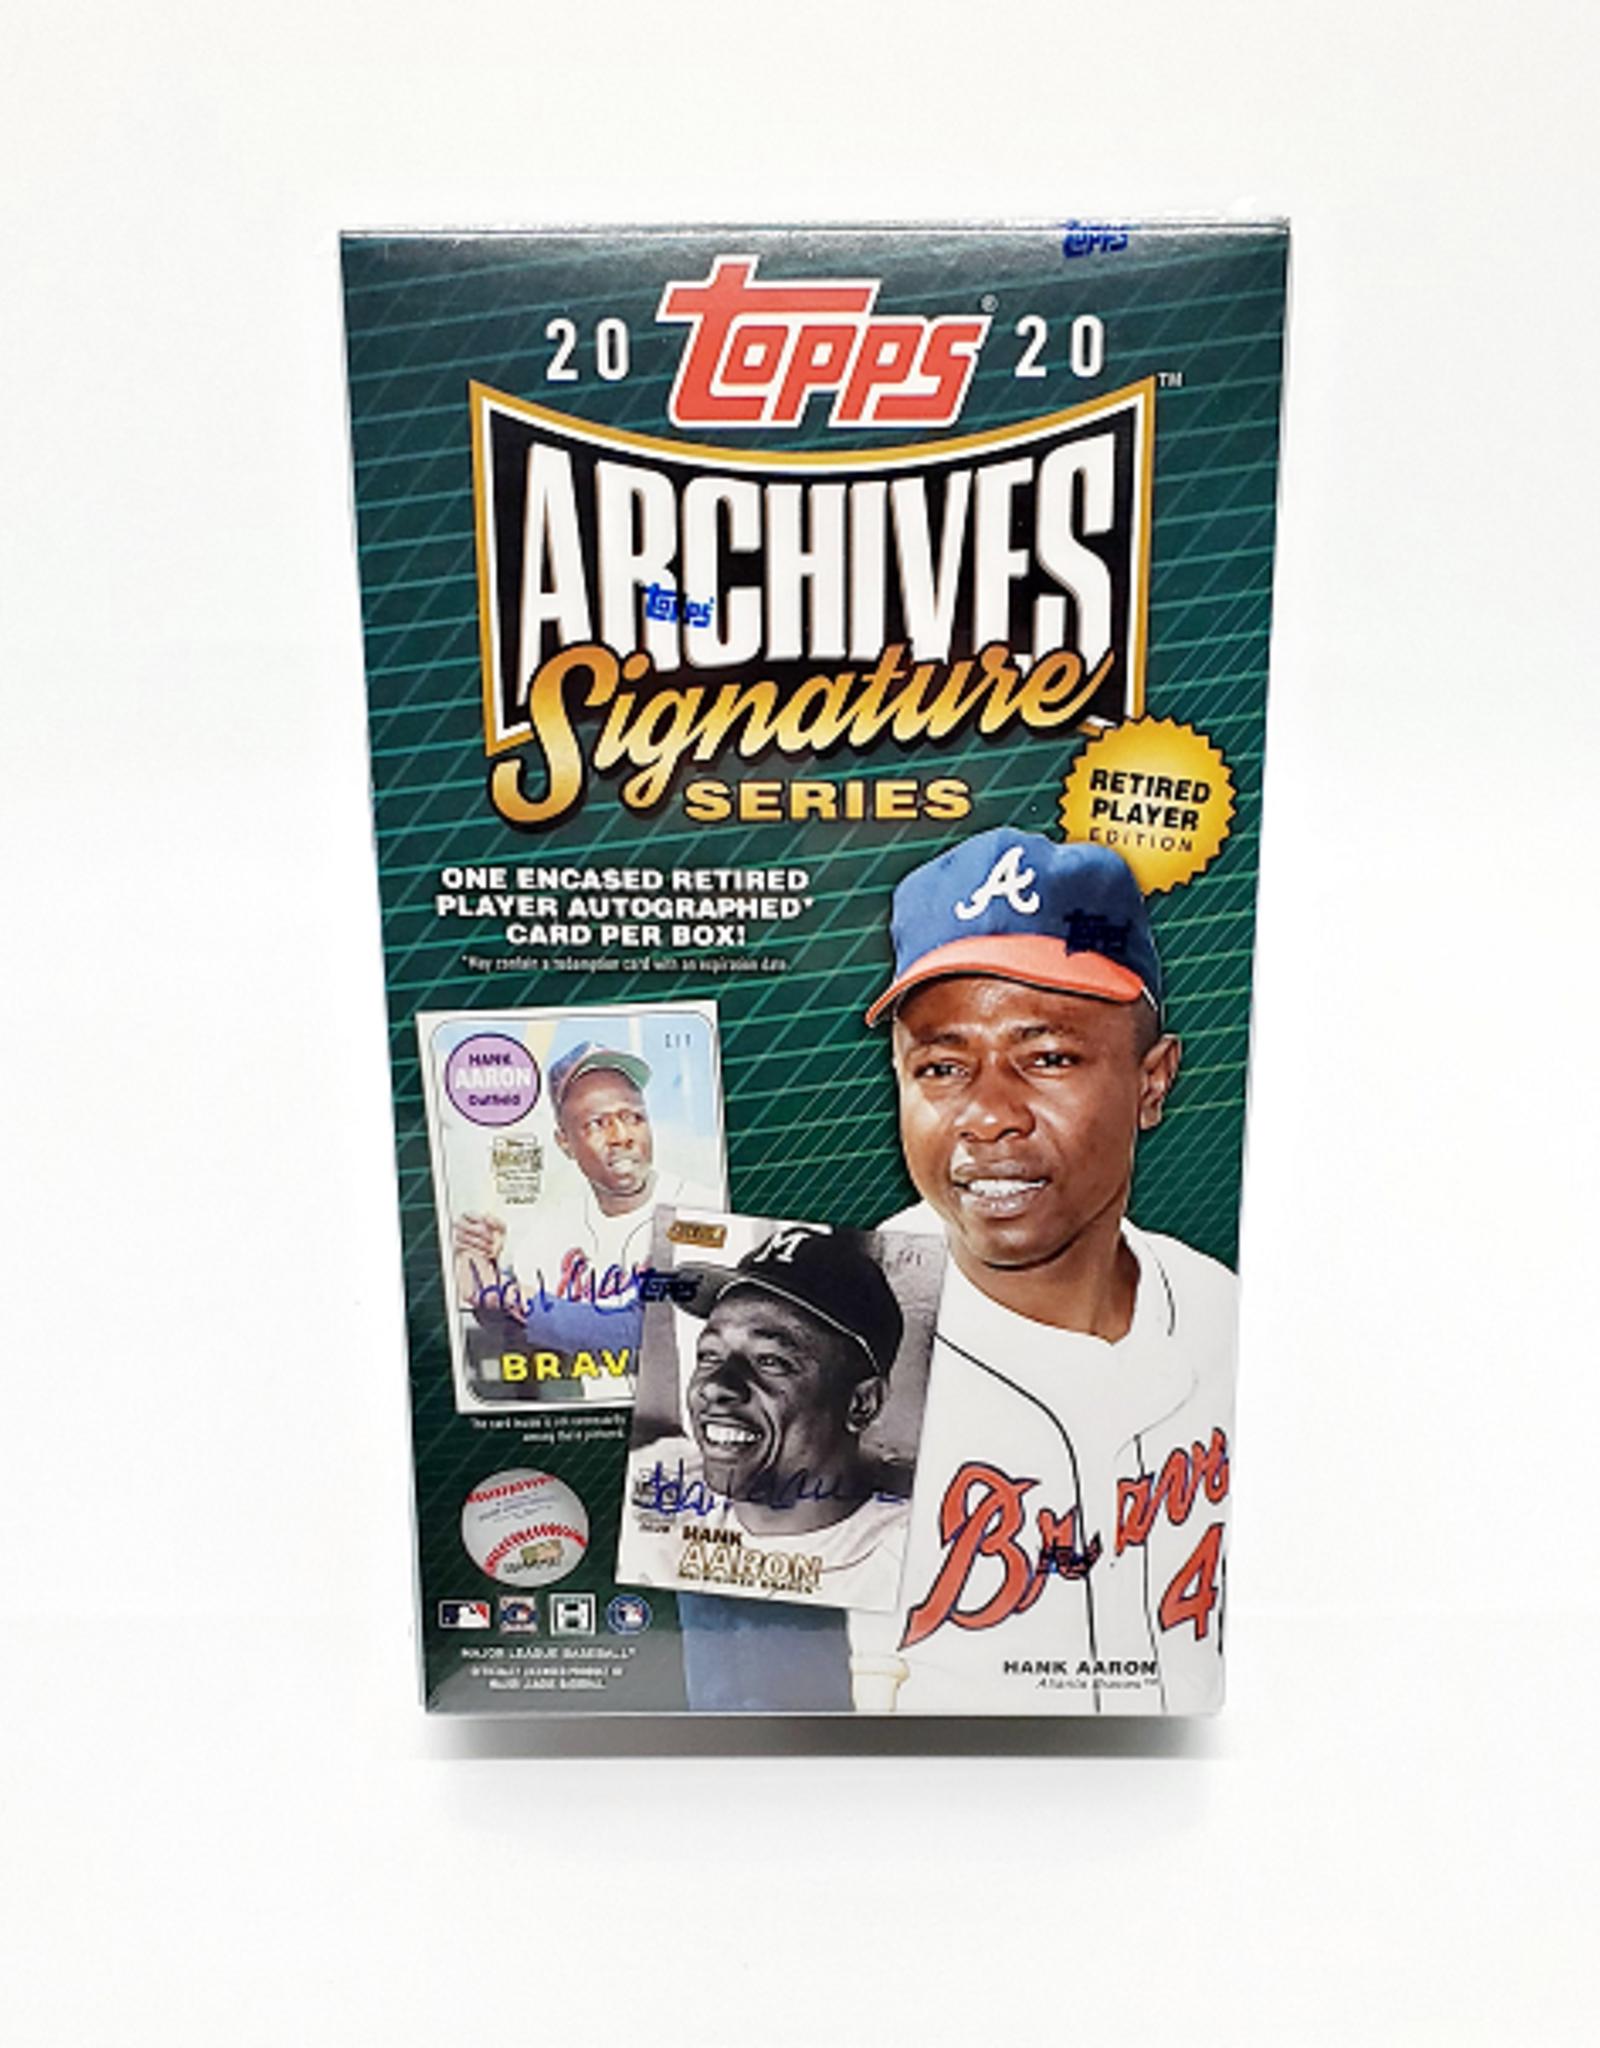 Topps 2020 Topps Archives Signature Series Baseball Retired Edition Hobby